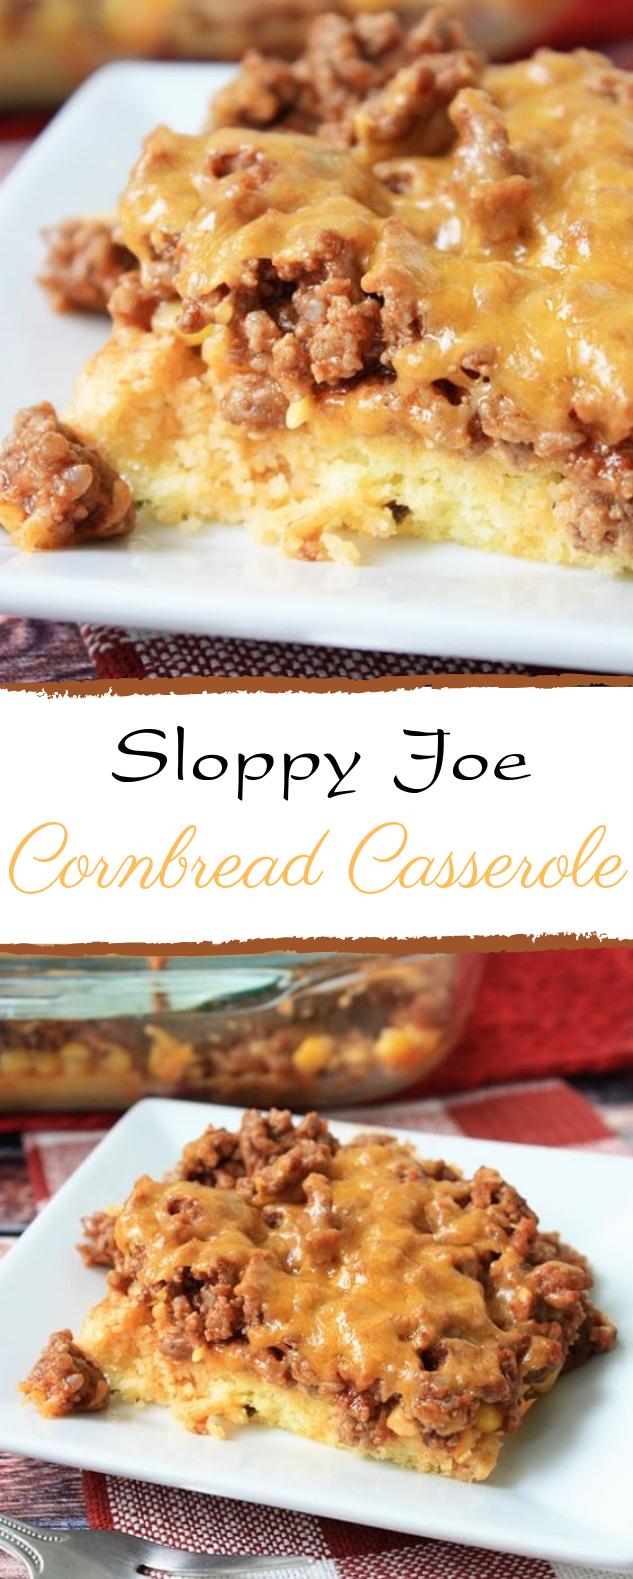 Sloppy Joe Cornbread Casserole #familyrecipe #deliciousmeal